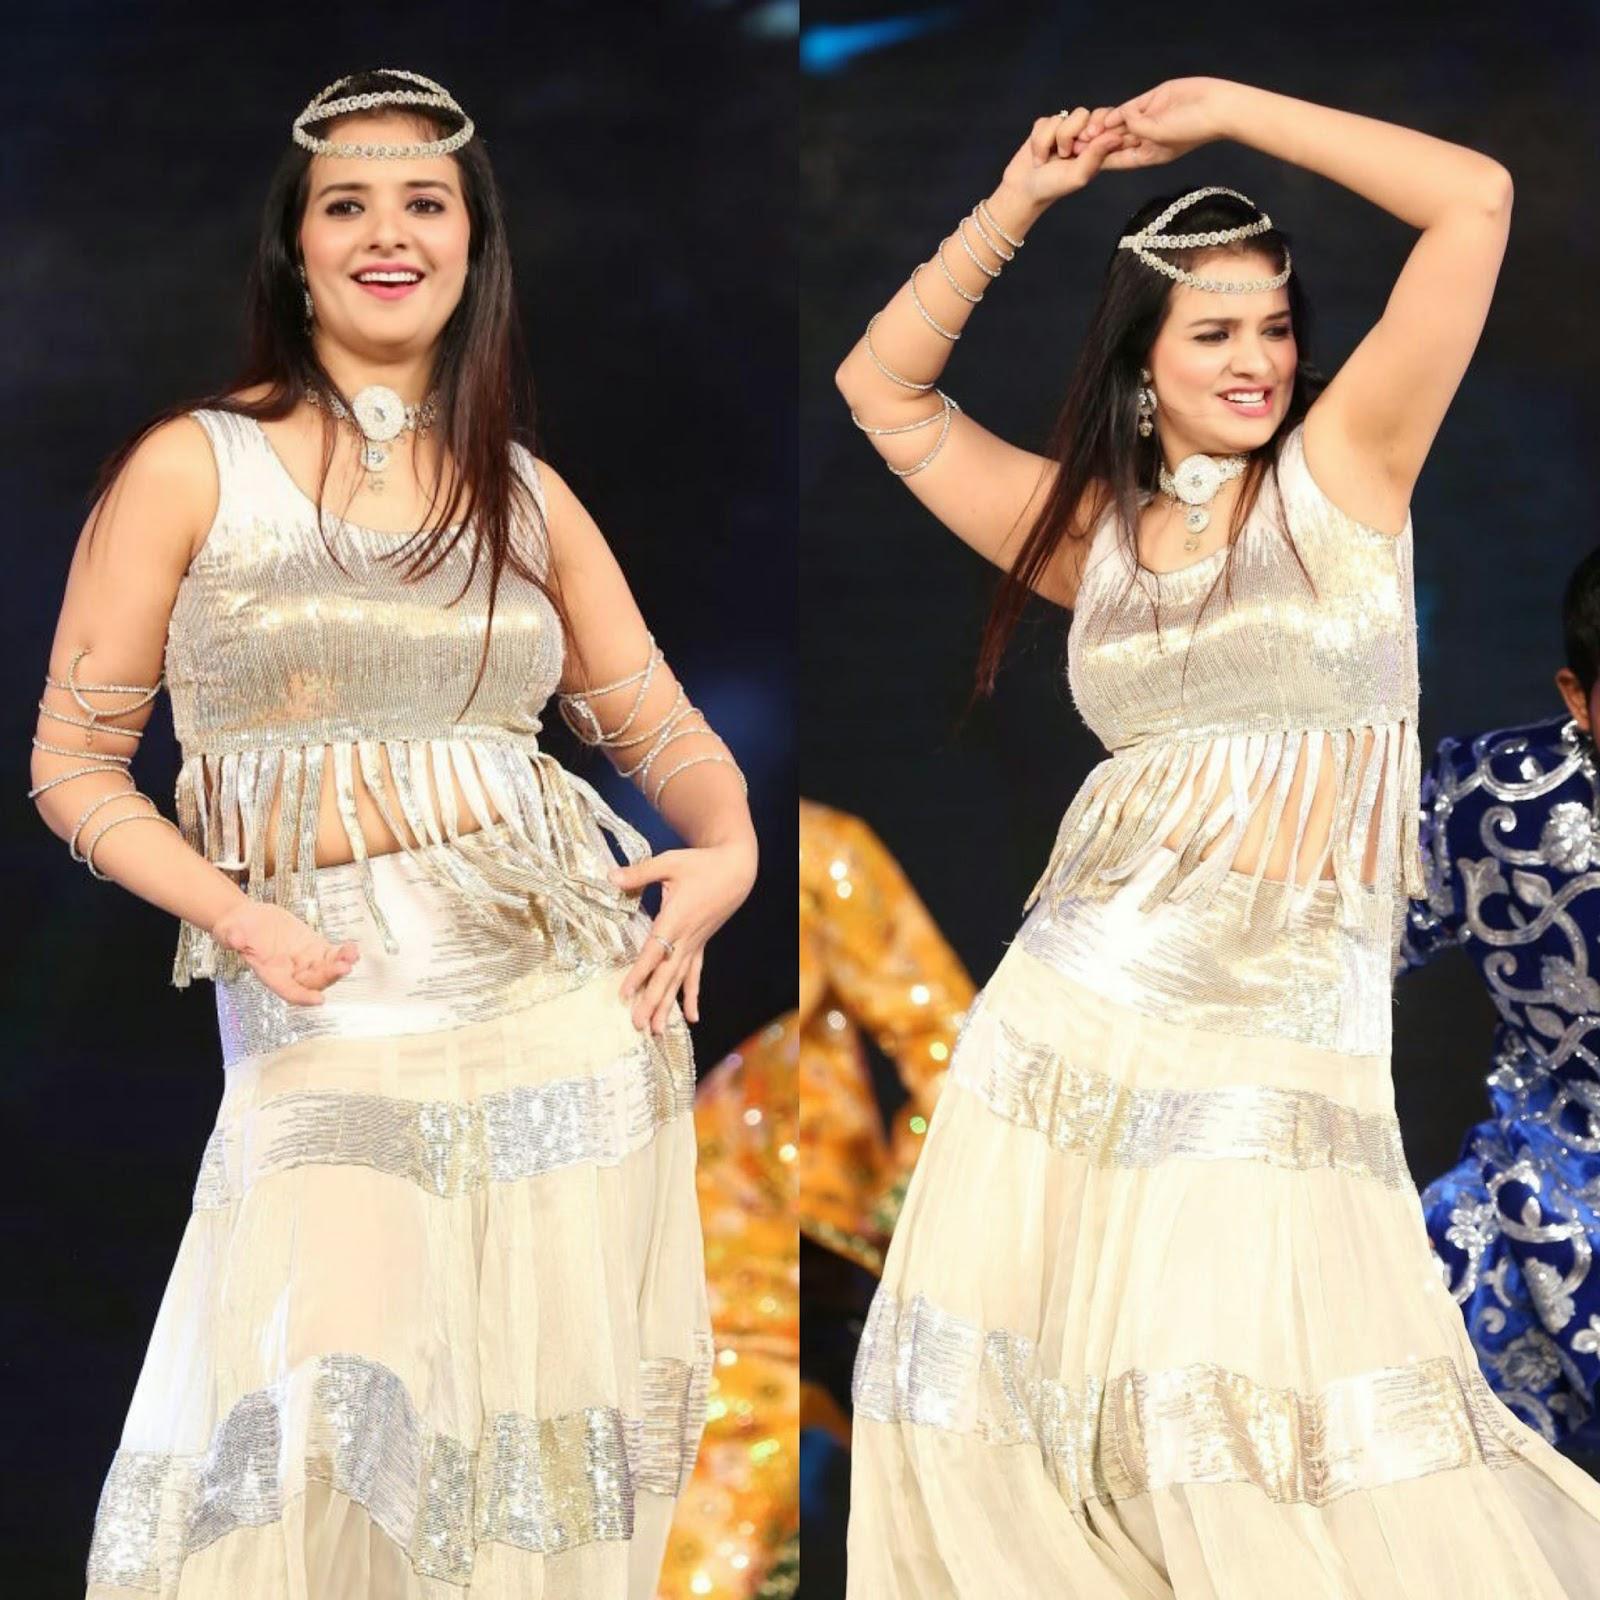 Actress Saloni Hot Spicy Dance Performance Photos Gallery at Gama Awards 2014